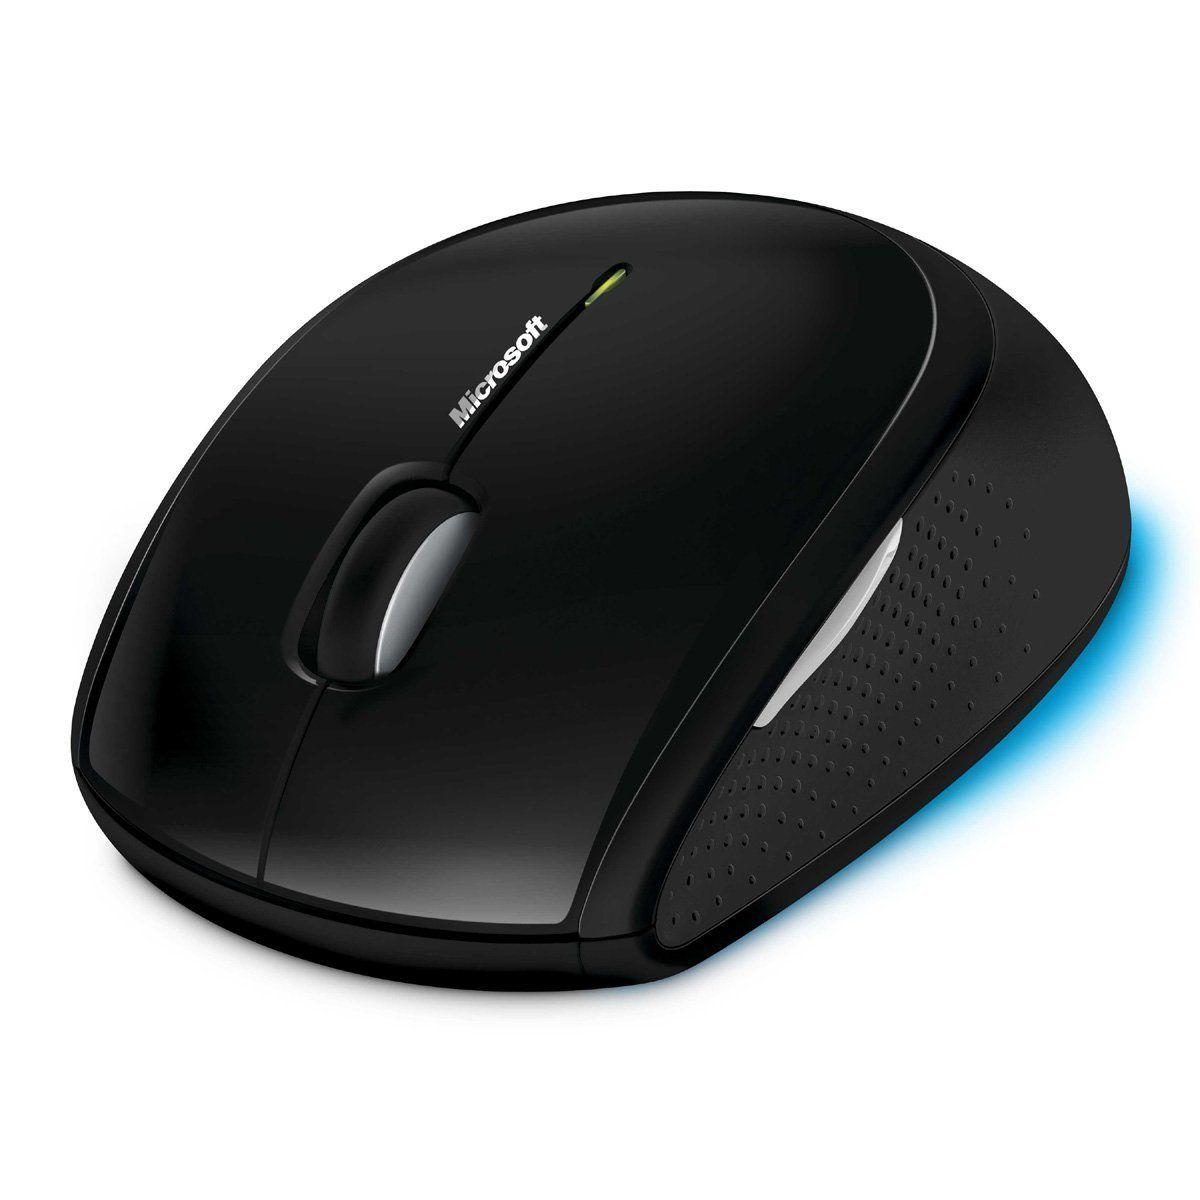 588c2a67689 AIM USA: Microsoft Wireless Comfort Desktop 5000 Keyboard and Mouse ...